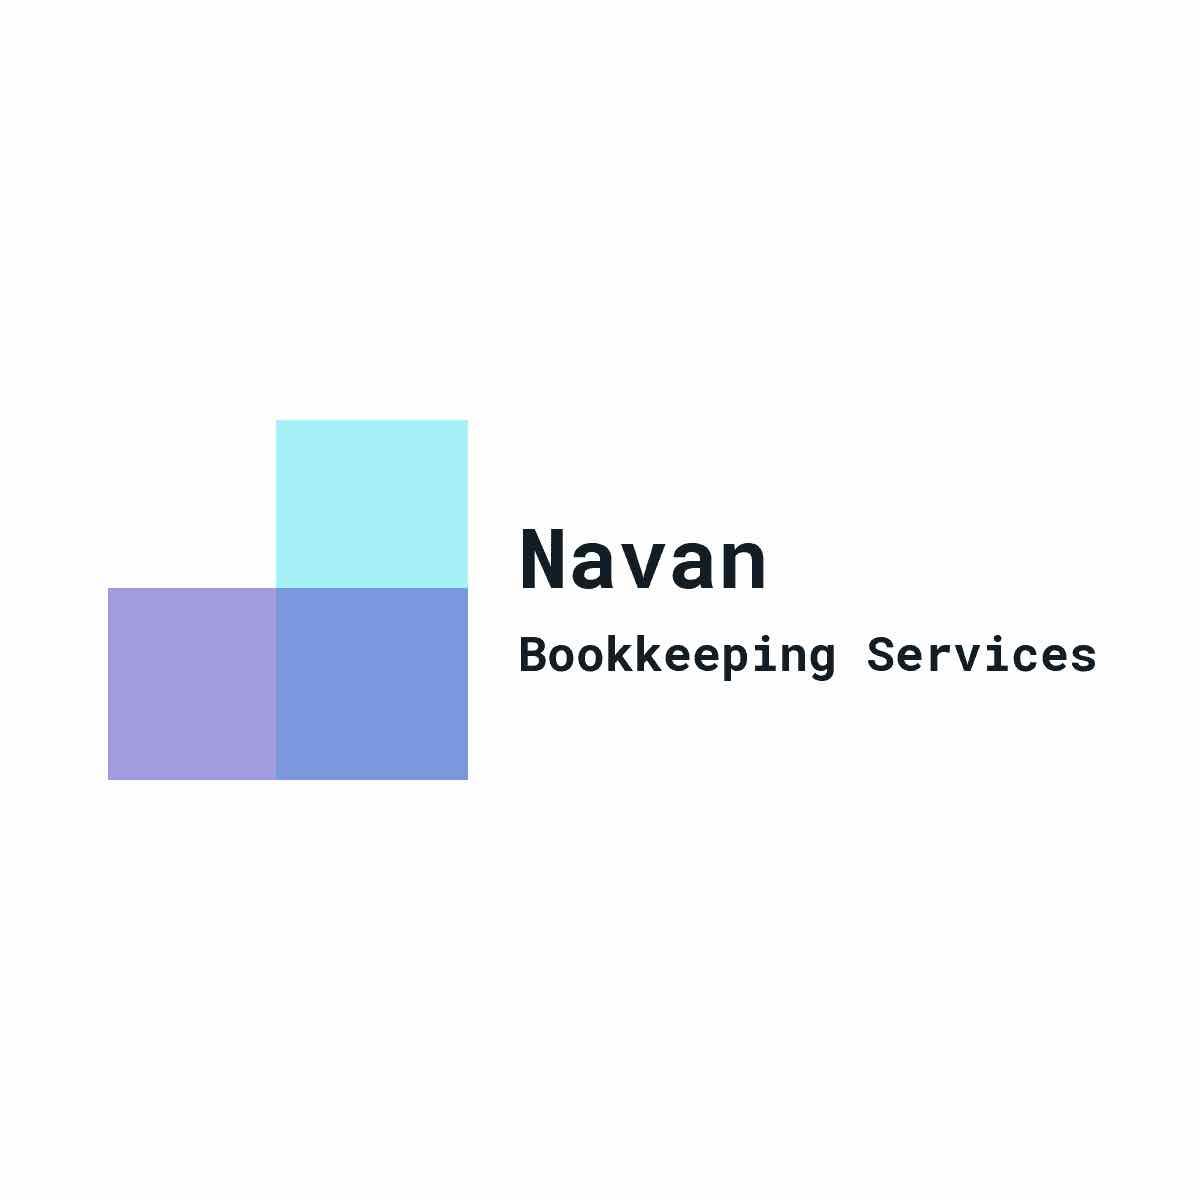 Navan Bookkeeping